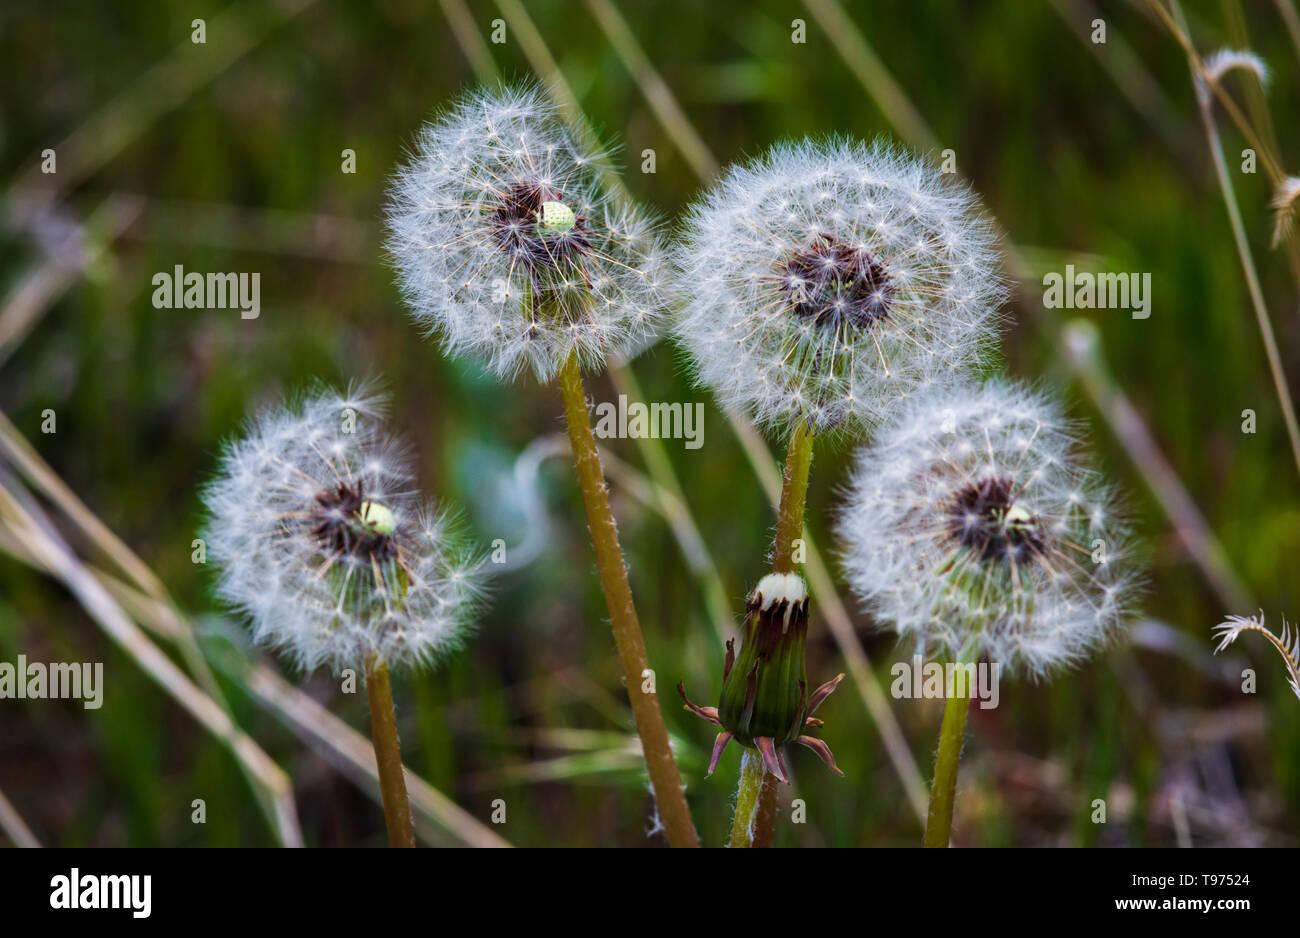 Dandelion seed heads (Taraxacum Officinale) in spring, Castle Rock Colorado US. Photo taken in May. - Stock Image